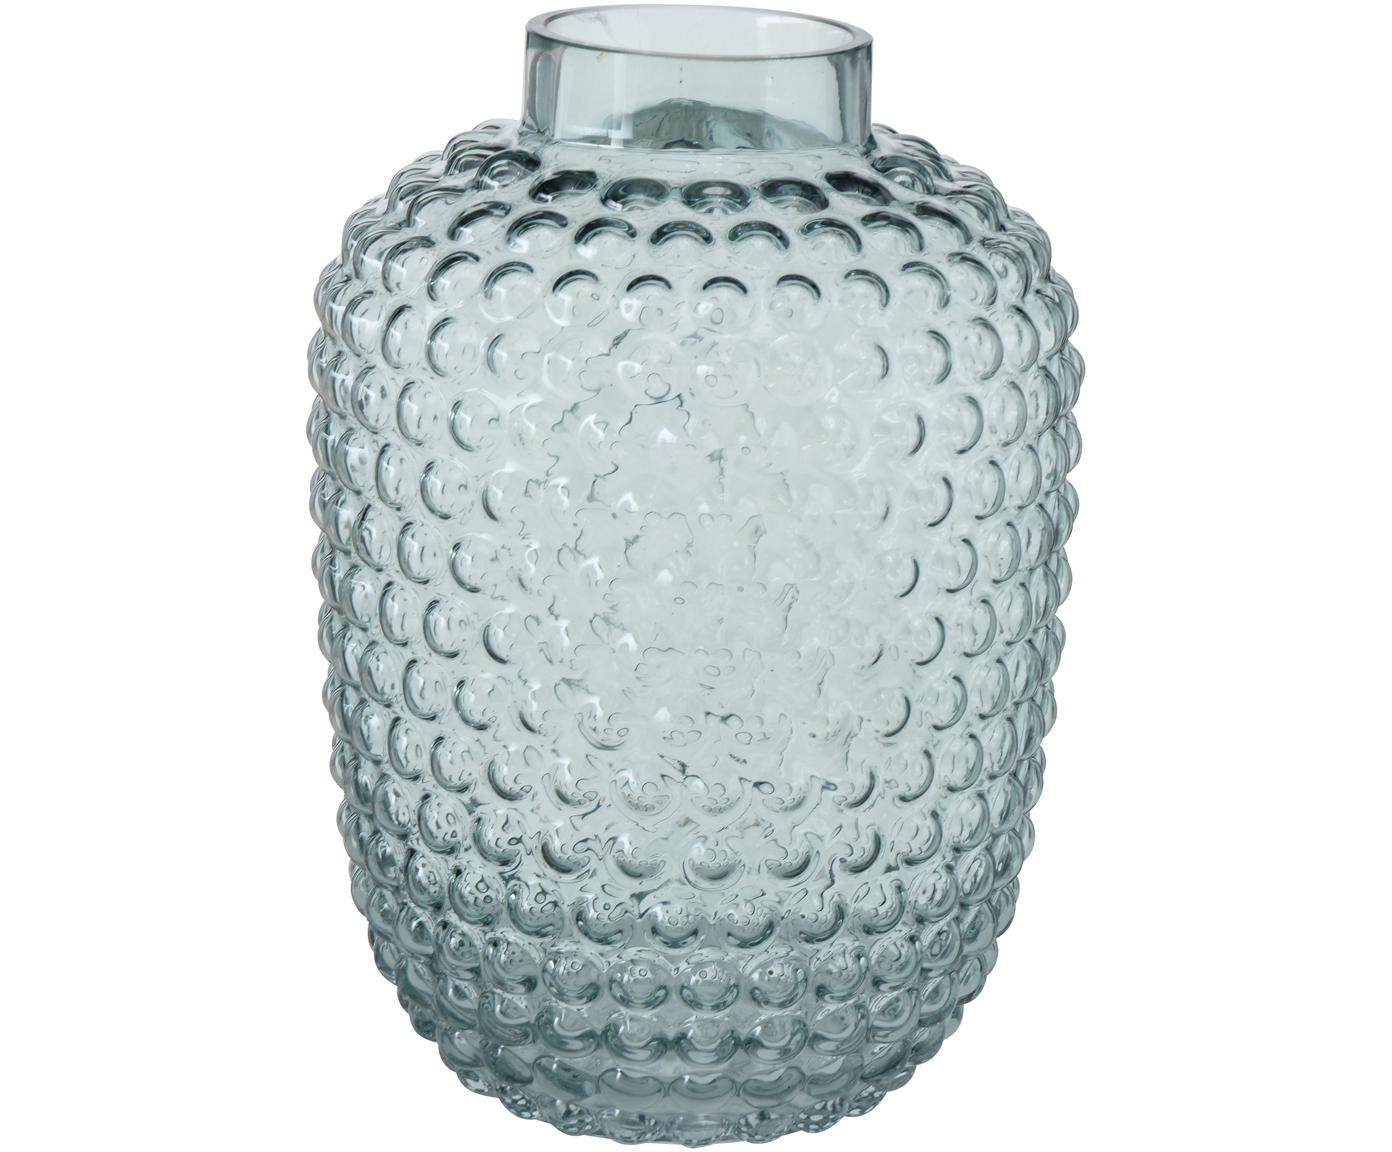 Glazen vaas Aubry, Glas, Groen, Ø 18 x H 25 cm